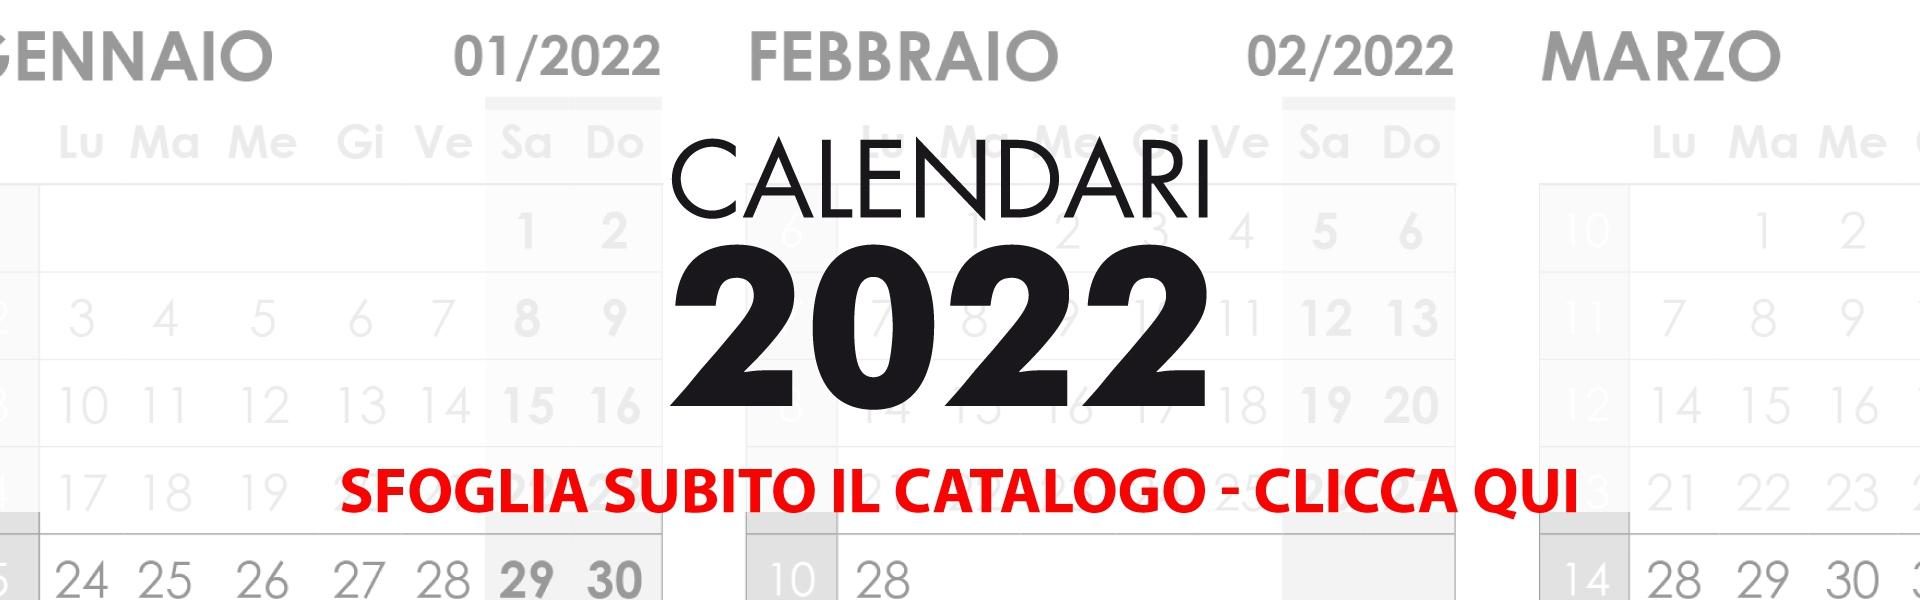 slide CALENDARI 2022